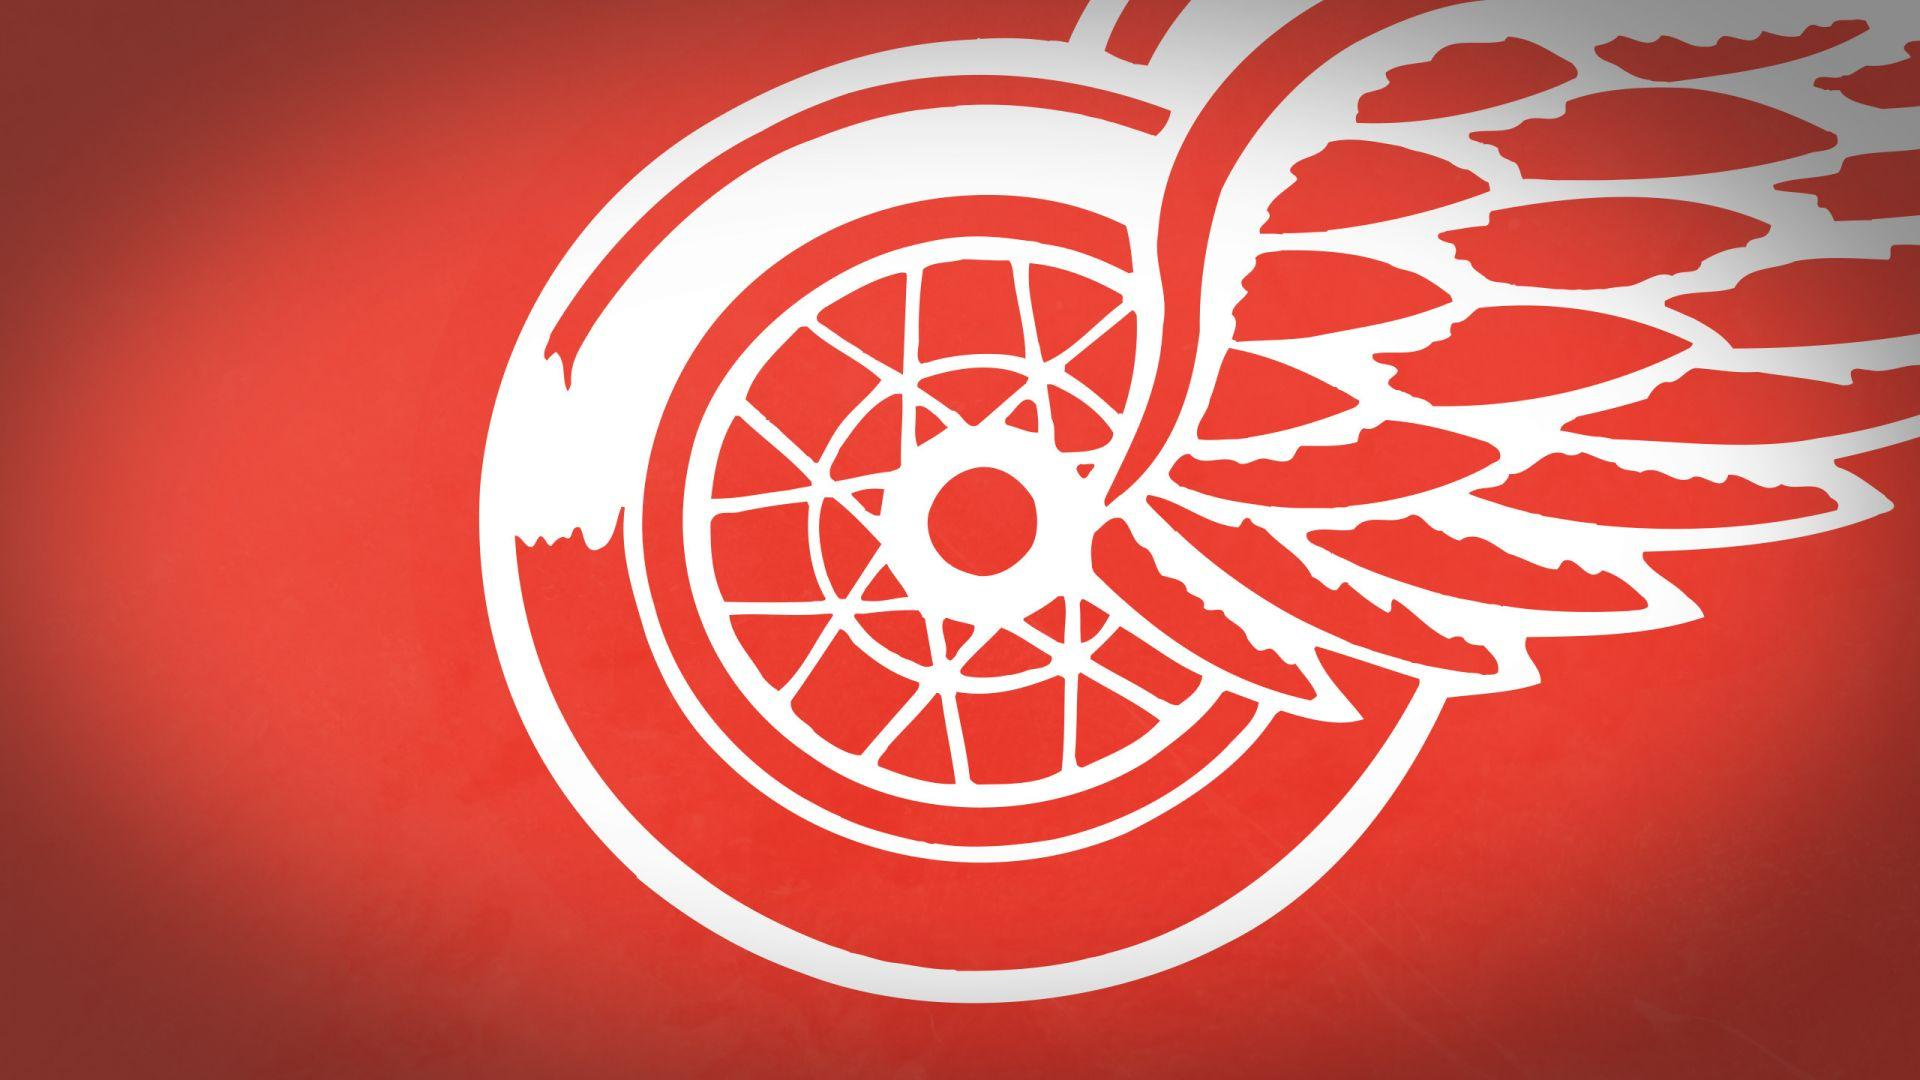 best red wings wallpaper - photo #31